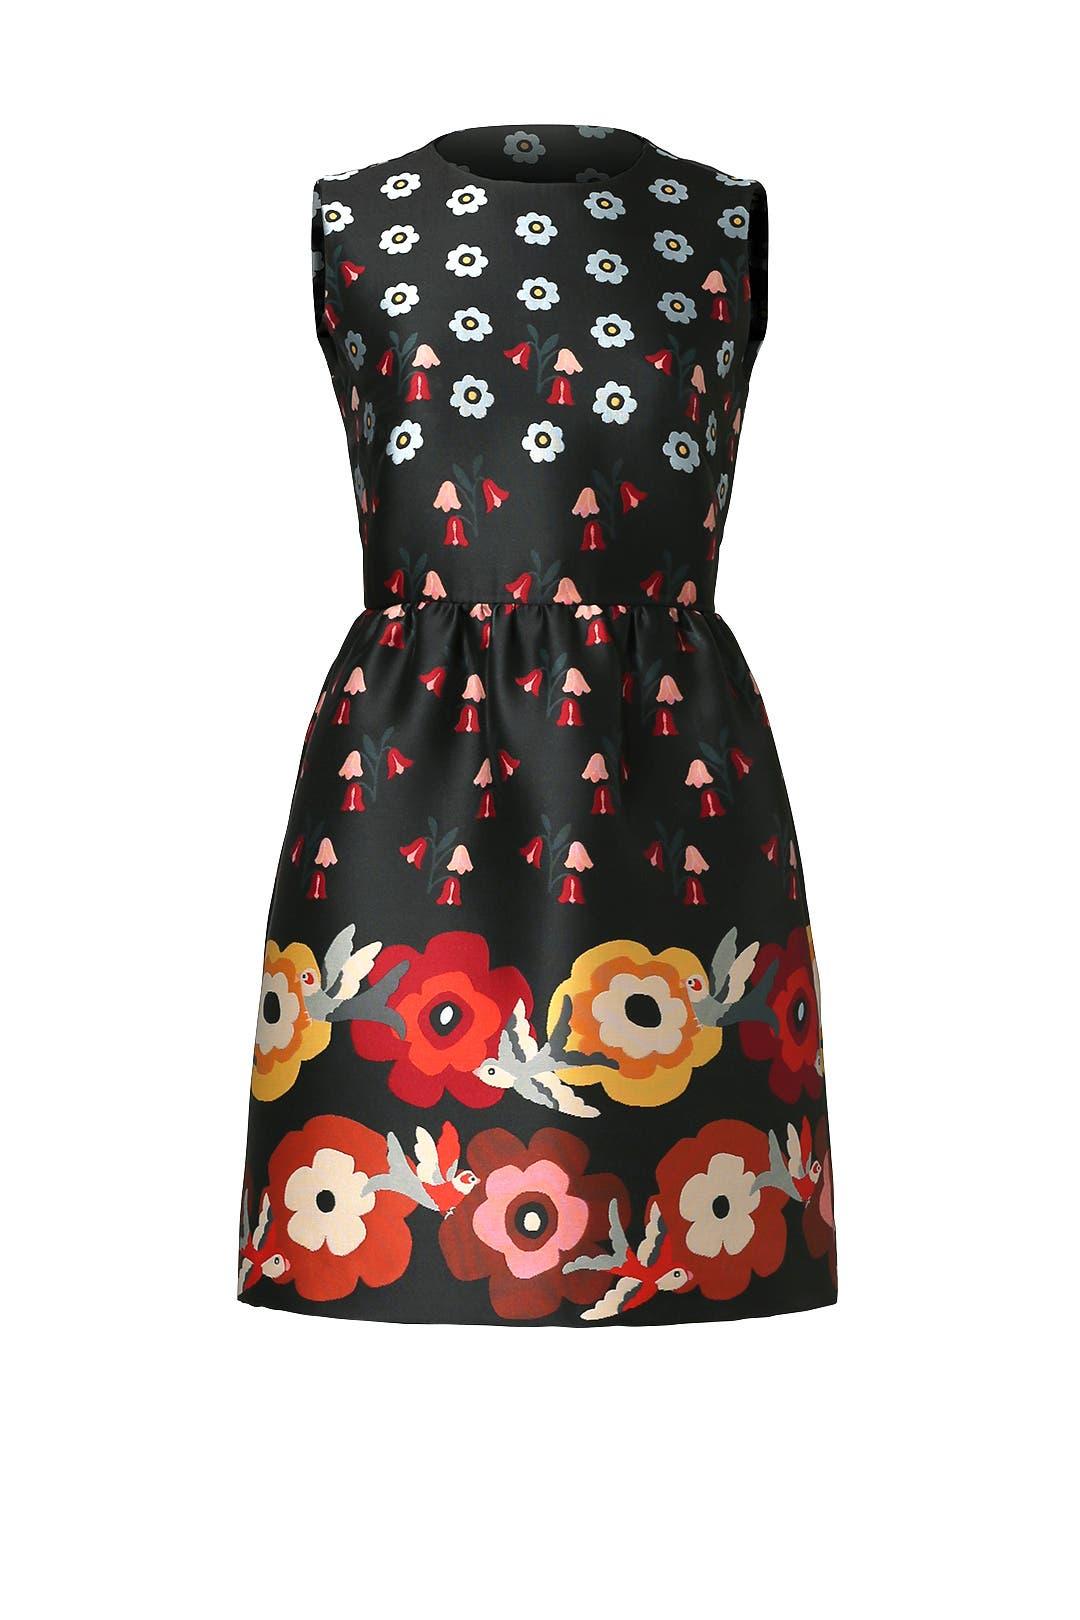 Red valentino black floral dress